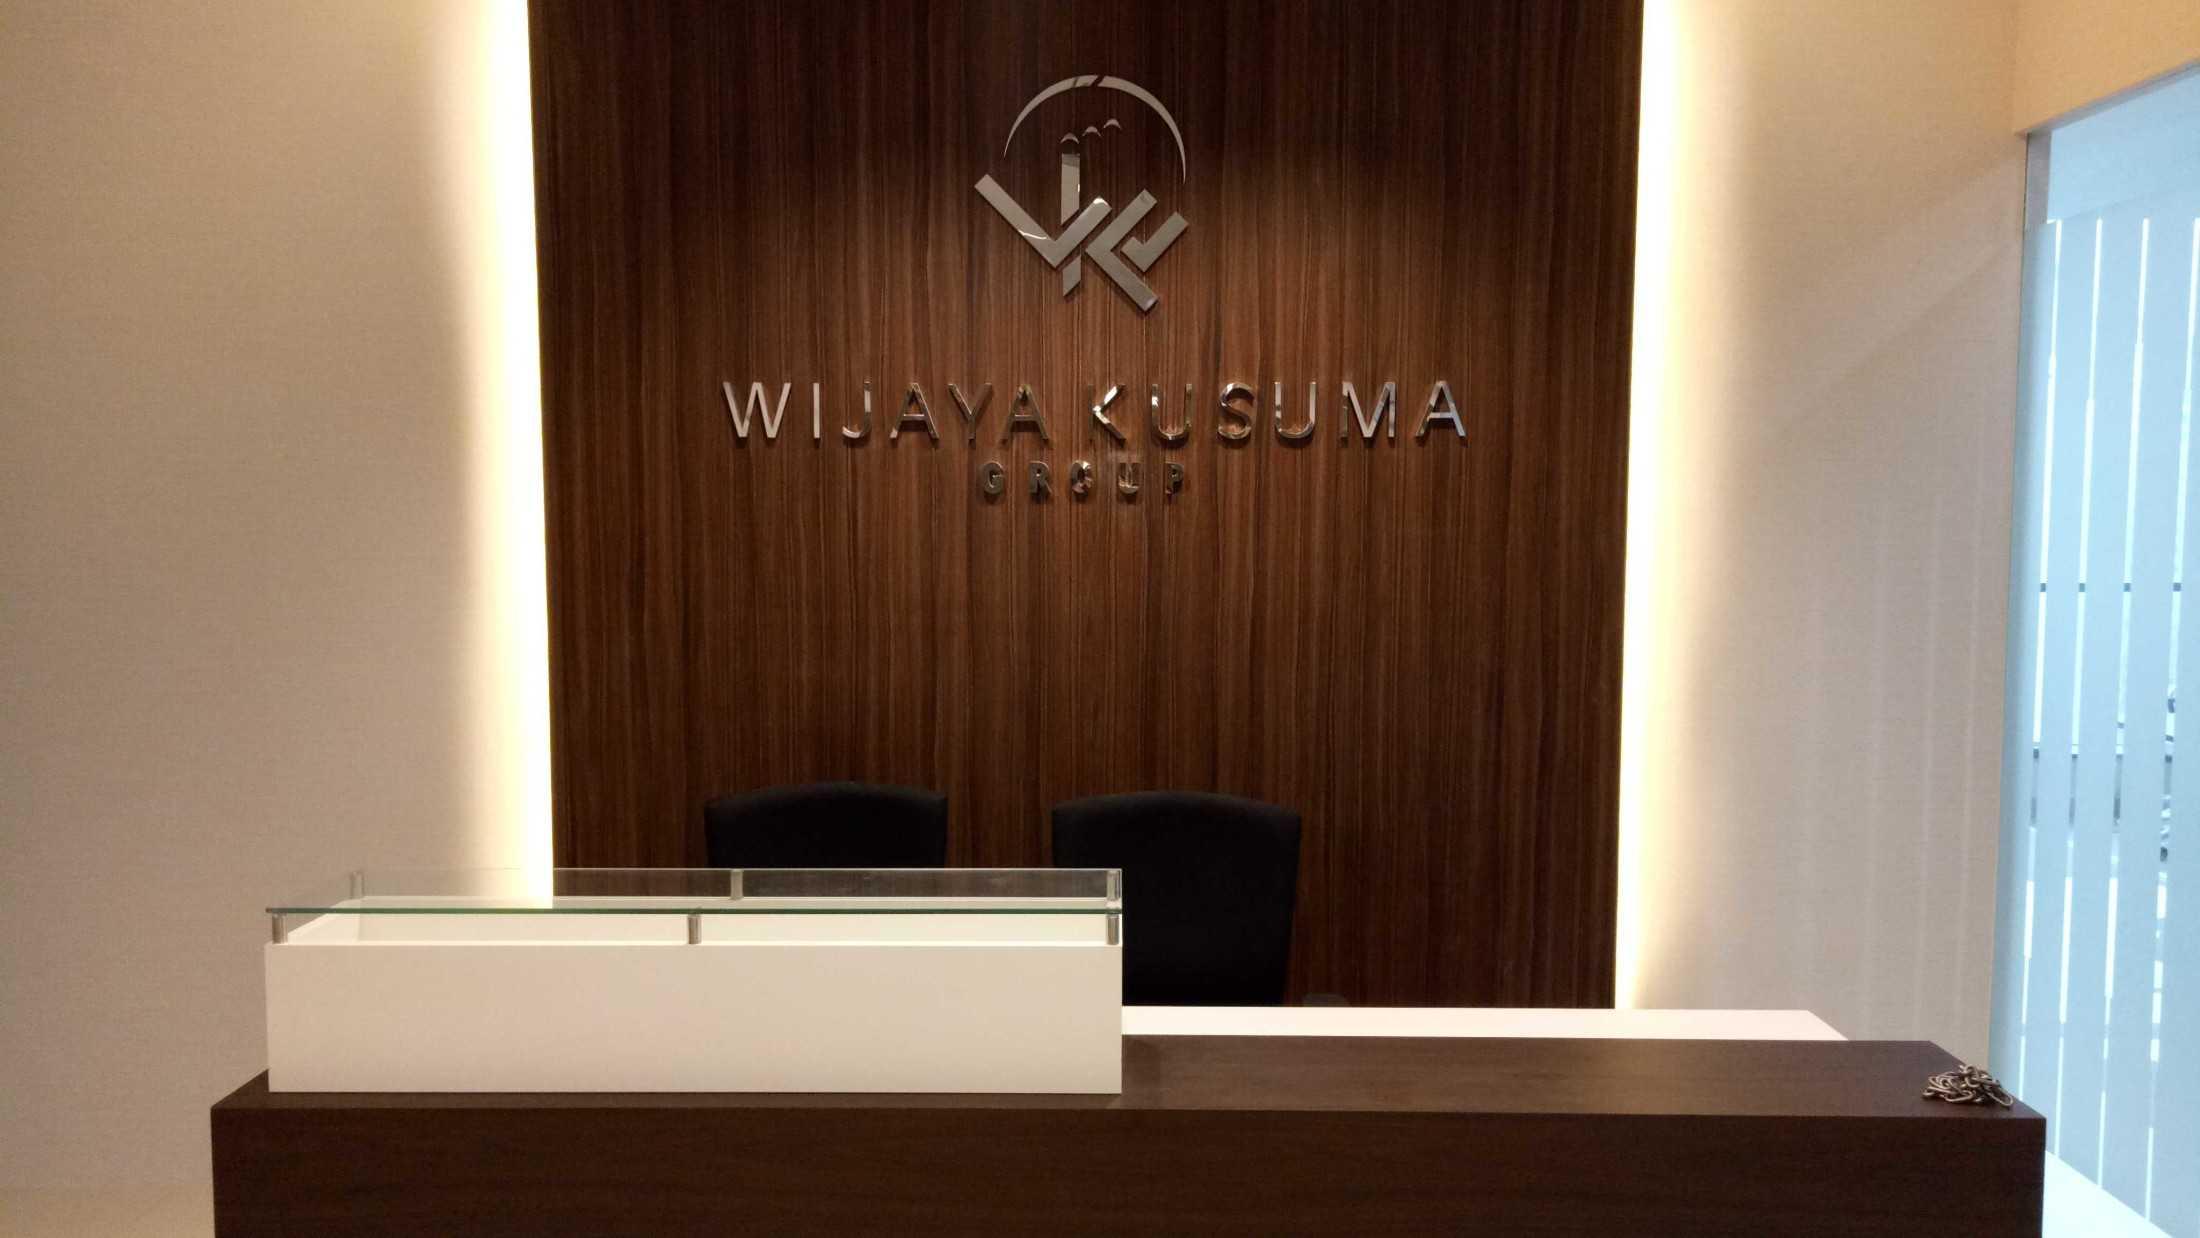 Xanli Interior Wijaya Kusuma Group Apl Tower, Rt.3/rw.5, Tj. Duren Sel., Grogol Petamburan, Kota Jakarta Barat, Daerah Khusus Ibukota Jakarta 11470, Indonesia Apl Tower, Rt.3/rw.5, Tj. Duren Sel., Grogol Petamburan, Kota Jakarta Barat, Daerah Khusus Ibukota Jakarta 11470, Indonesia Xanli-Interior-Wijaya-Kusuma-Group Modern 64147